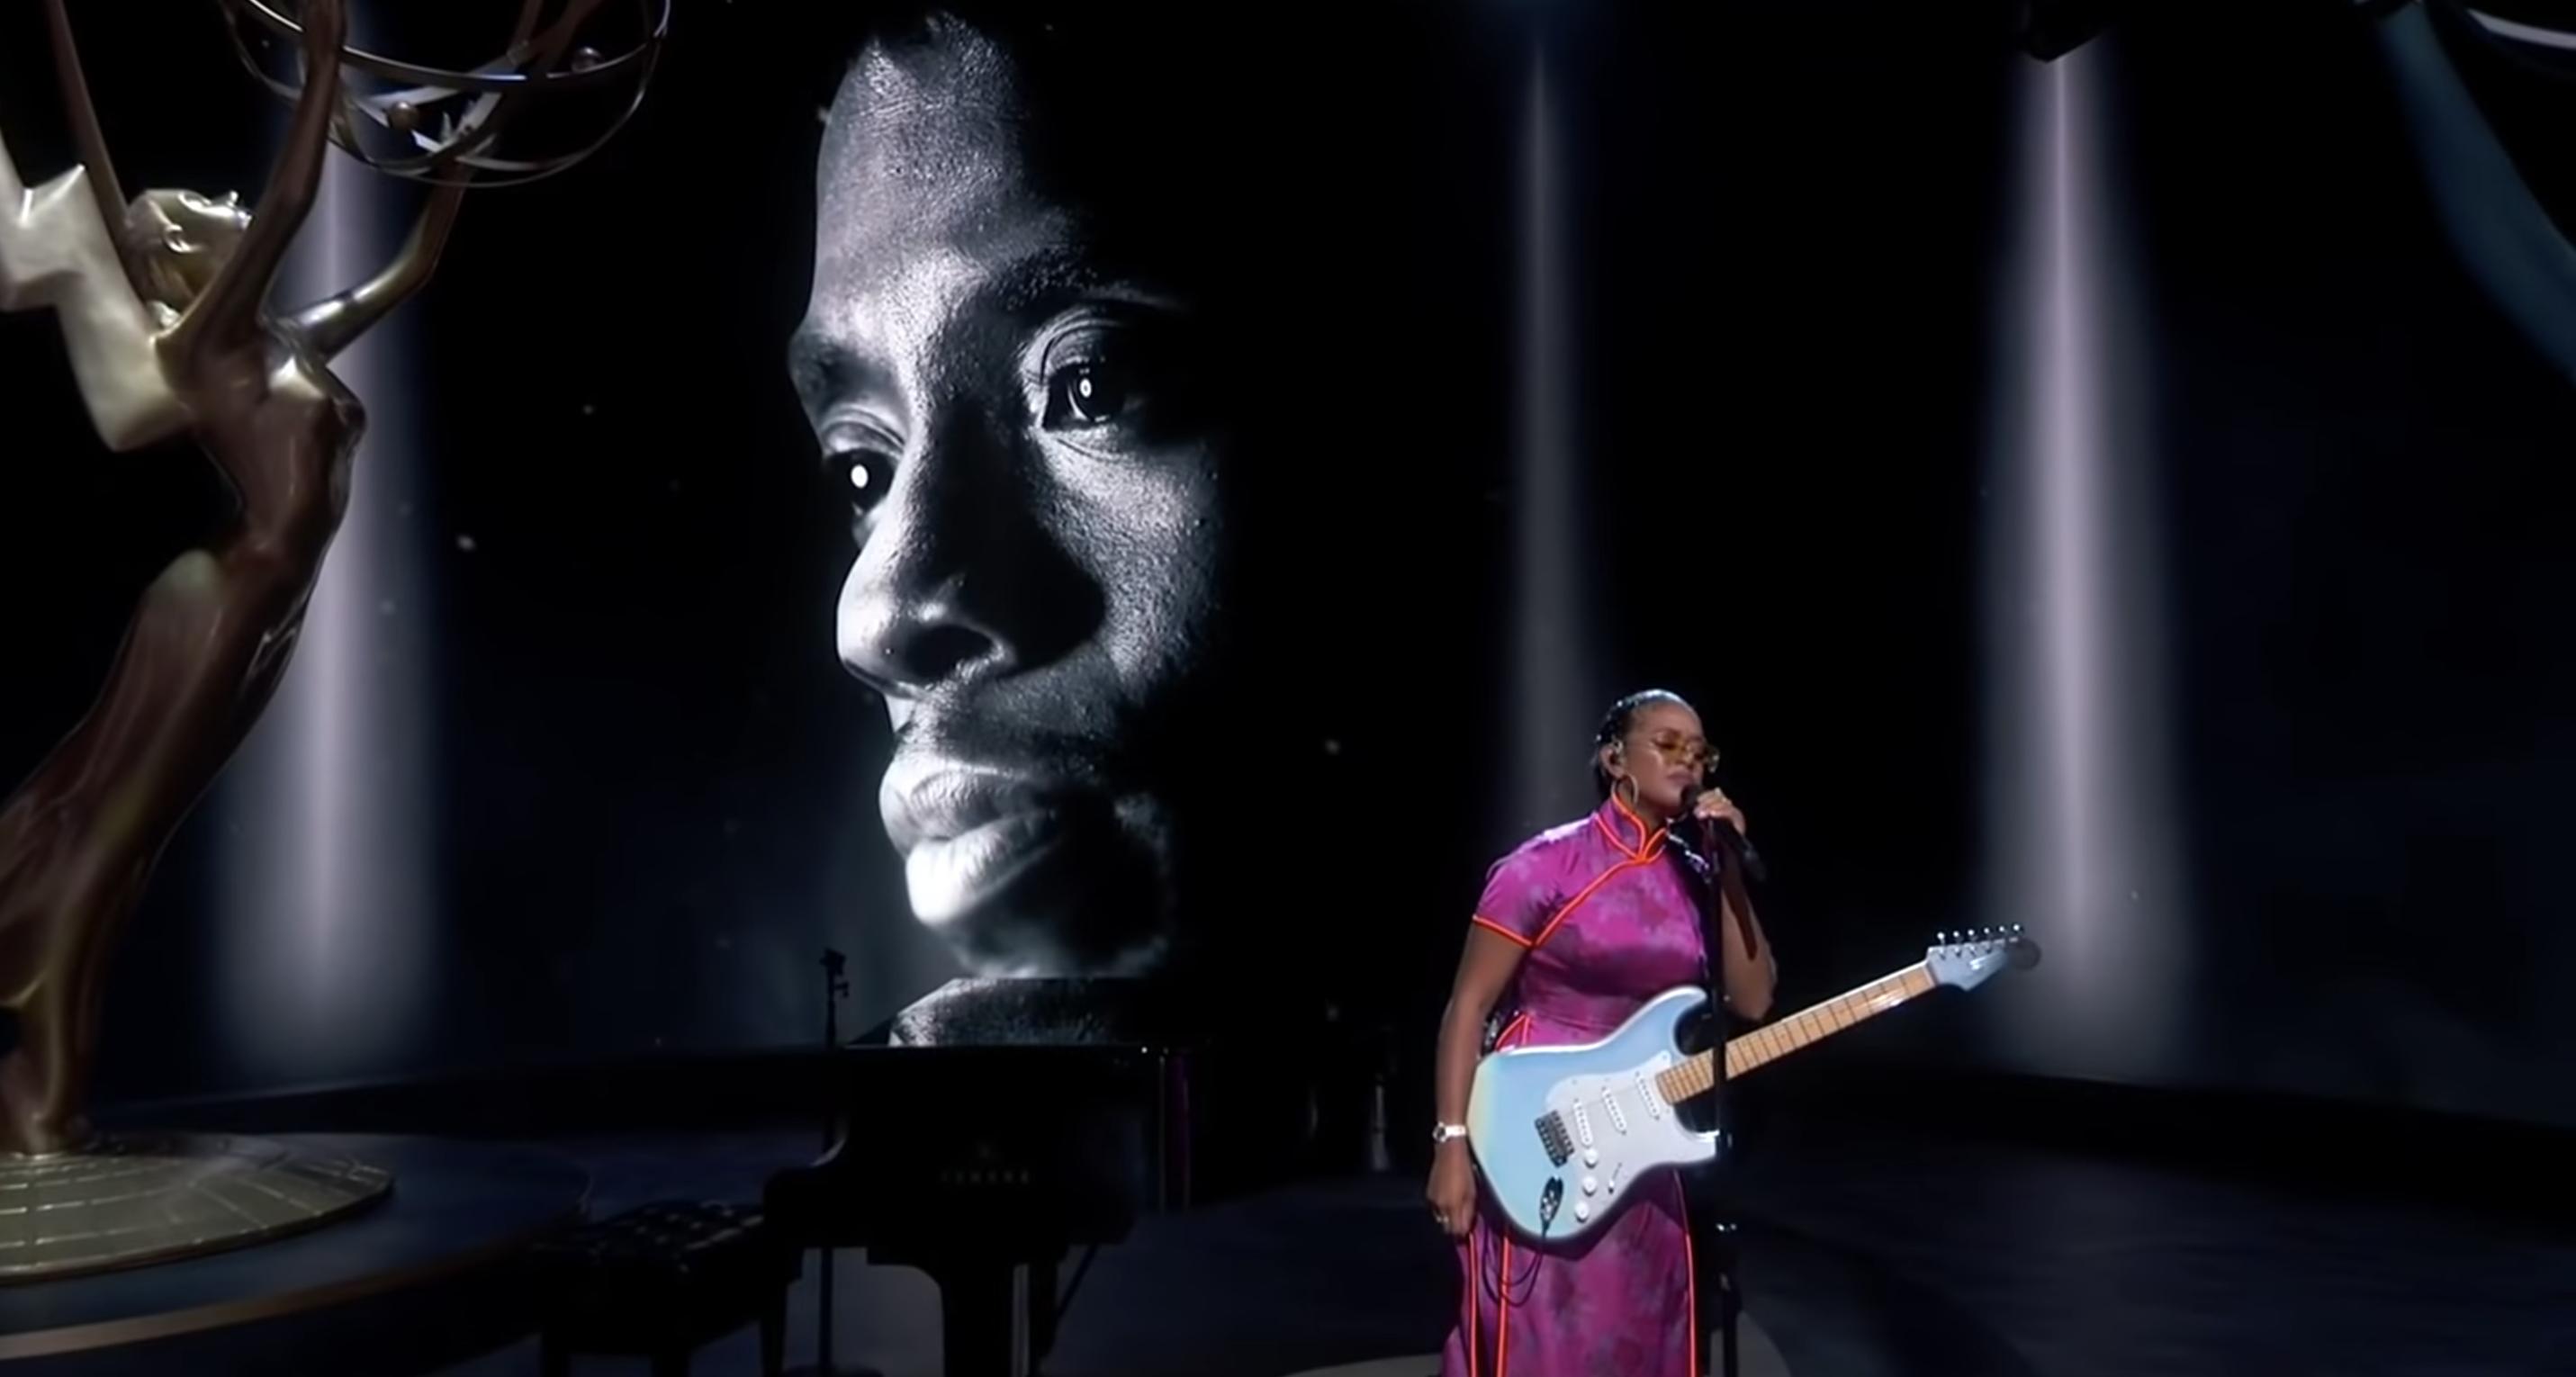 Chadwick Boseman, RBG and Naya Rivera among those honored during Emmys 'in memoriam' segment thumbnail